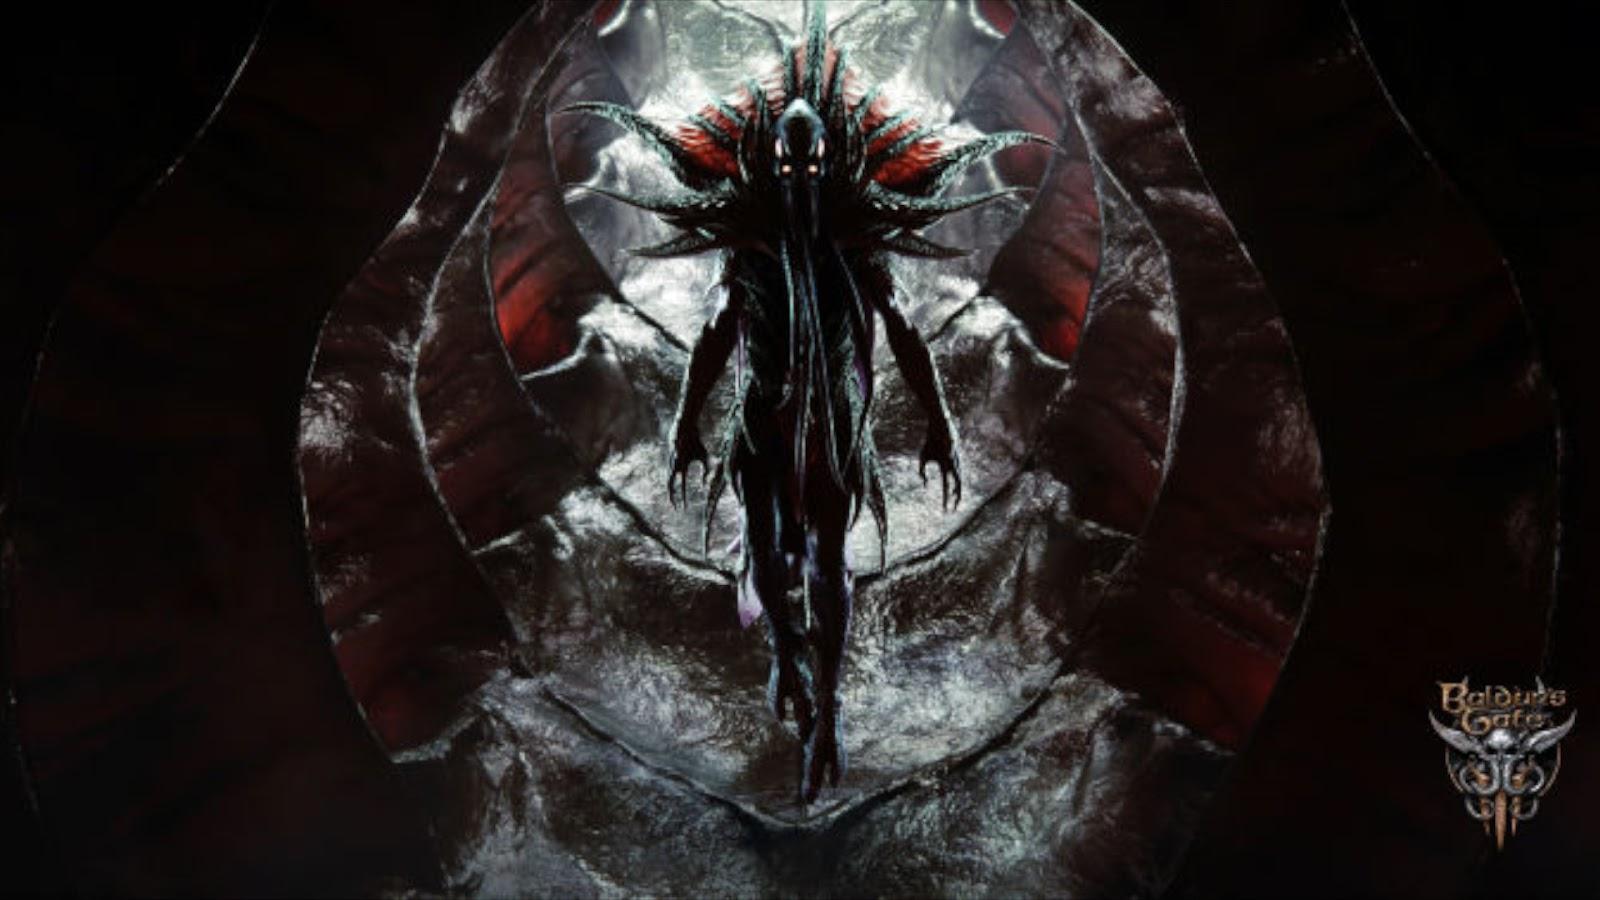 News Collider - Board Game News - Baldurs Gate 3 New Art Work Mindflayer